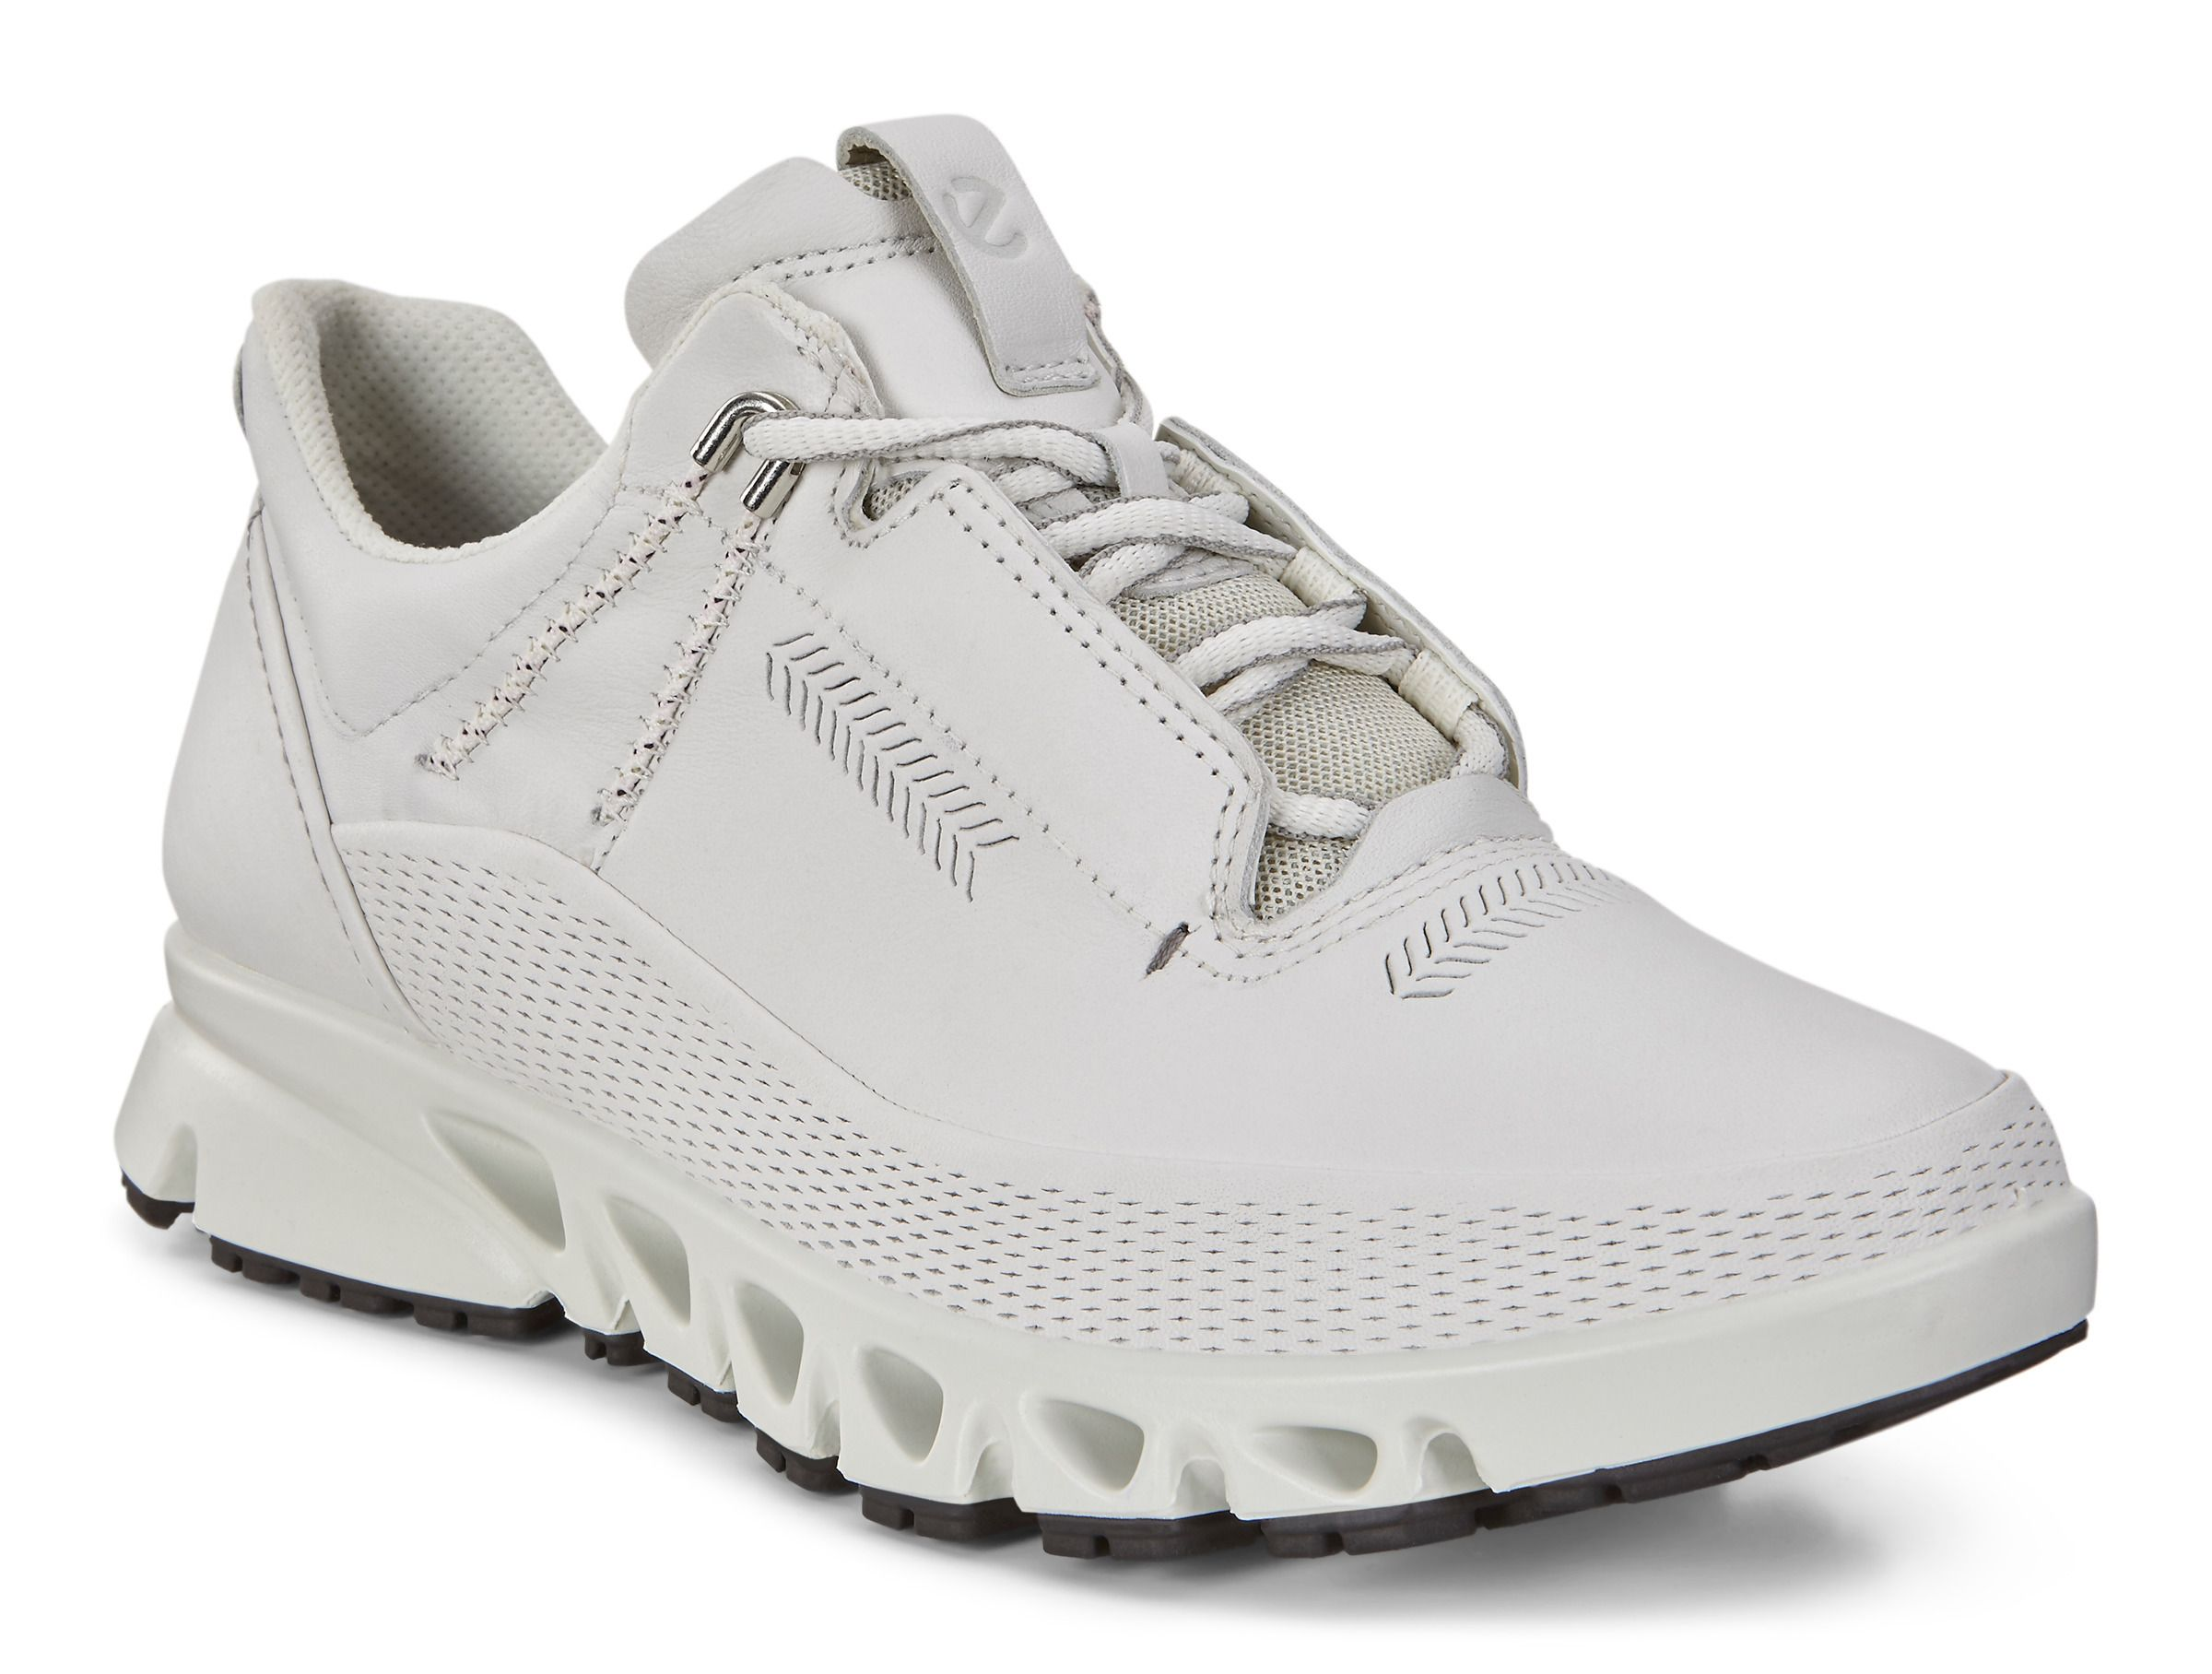 Ecco Women's Offroad Sandals Multi 10M | Womens sandals